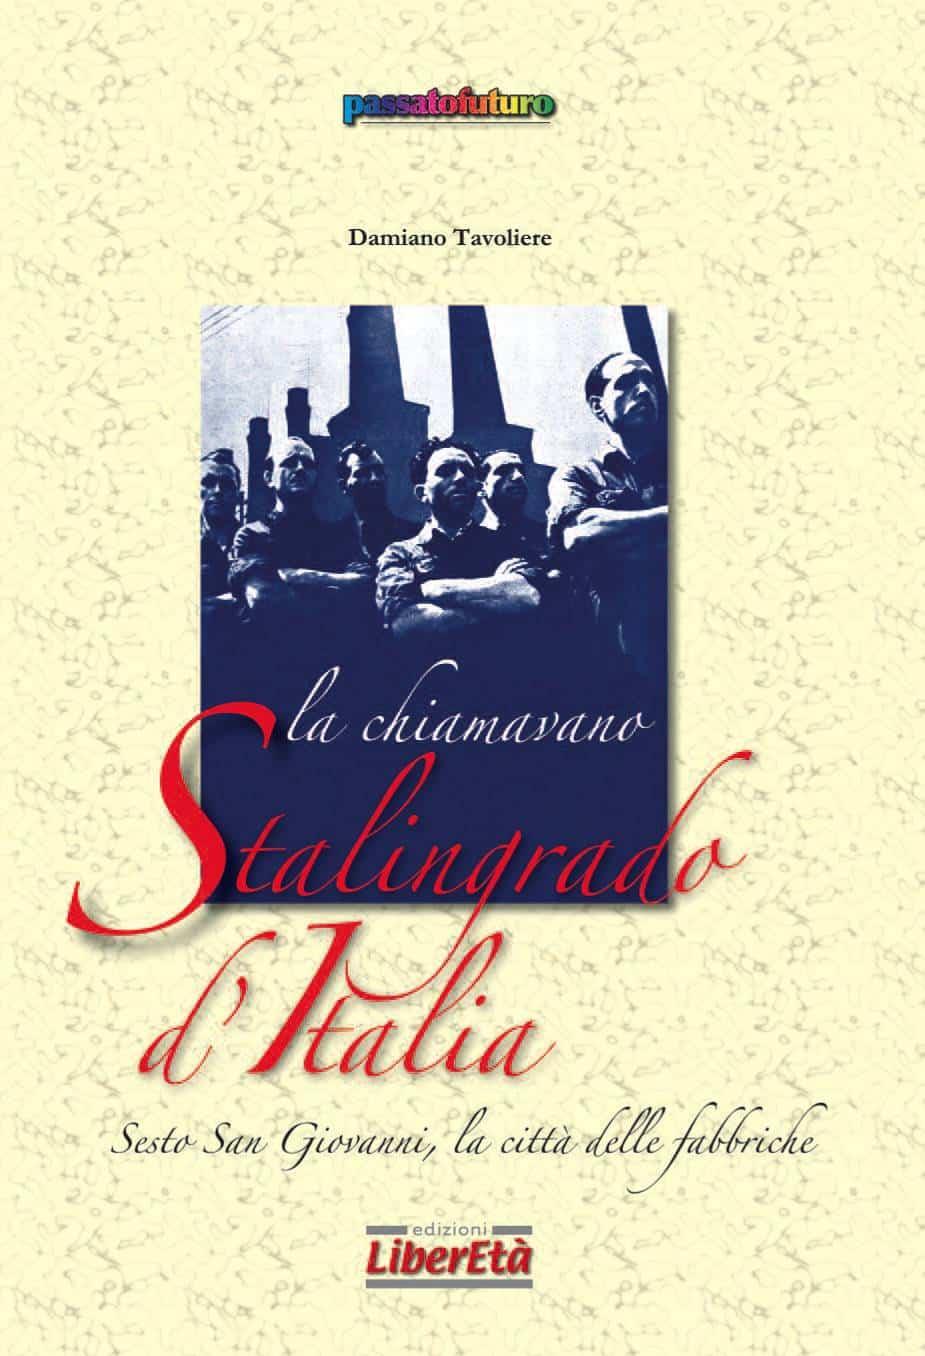 Stalingrado-dItalia